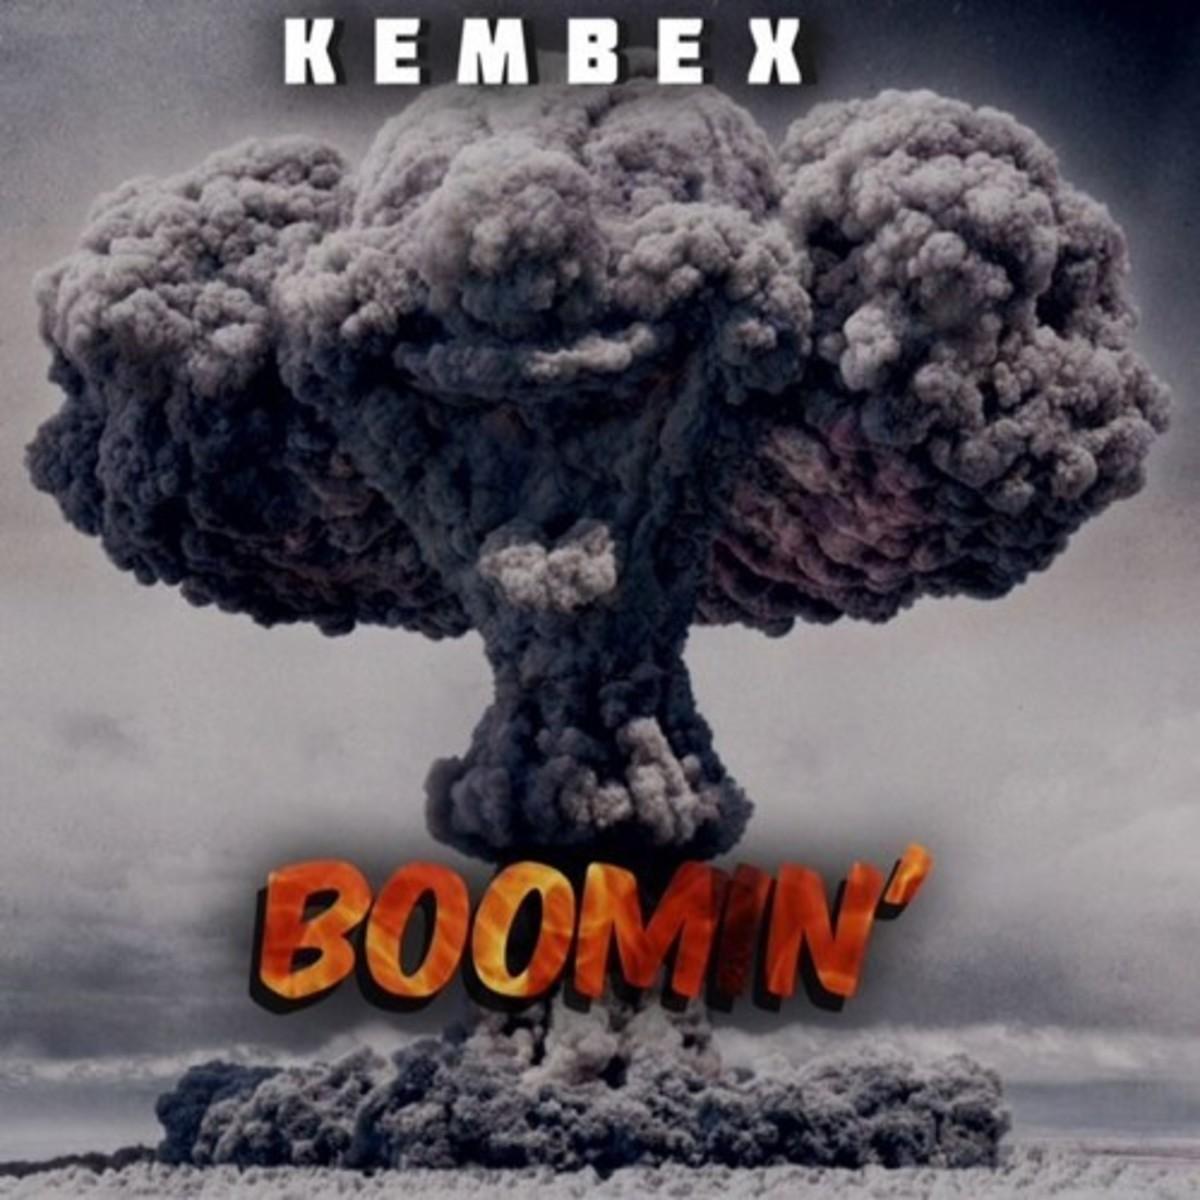 kembe-x-boomin.jpg